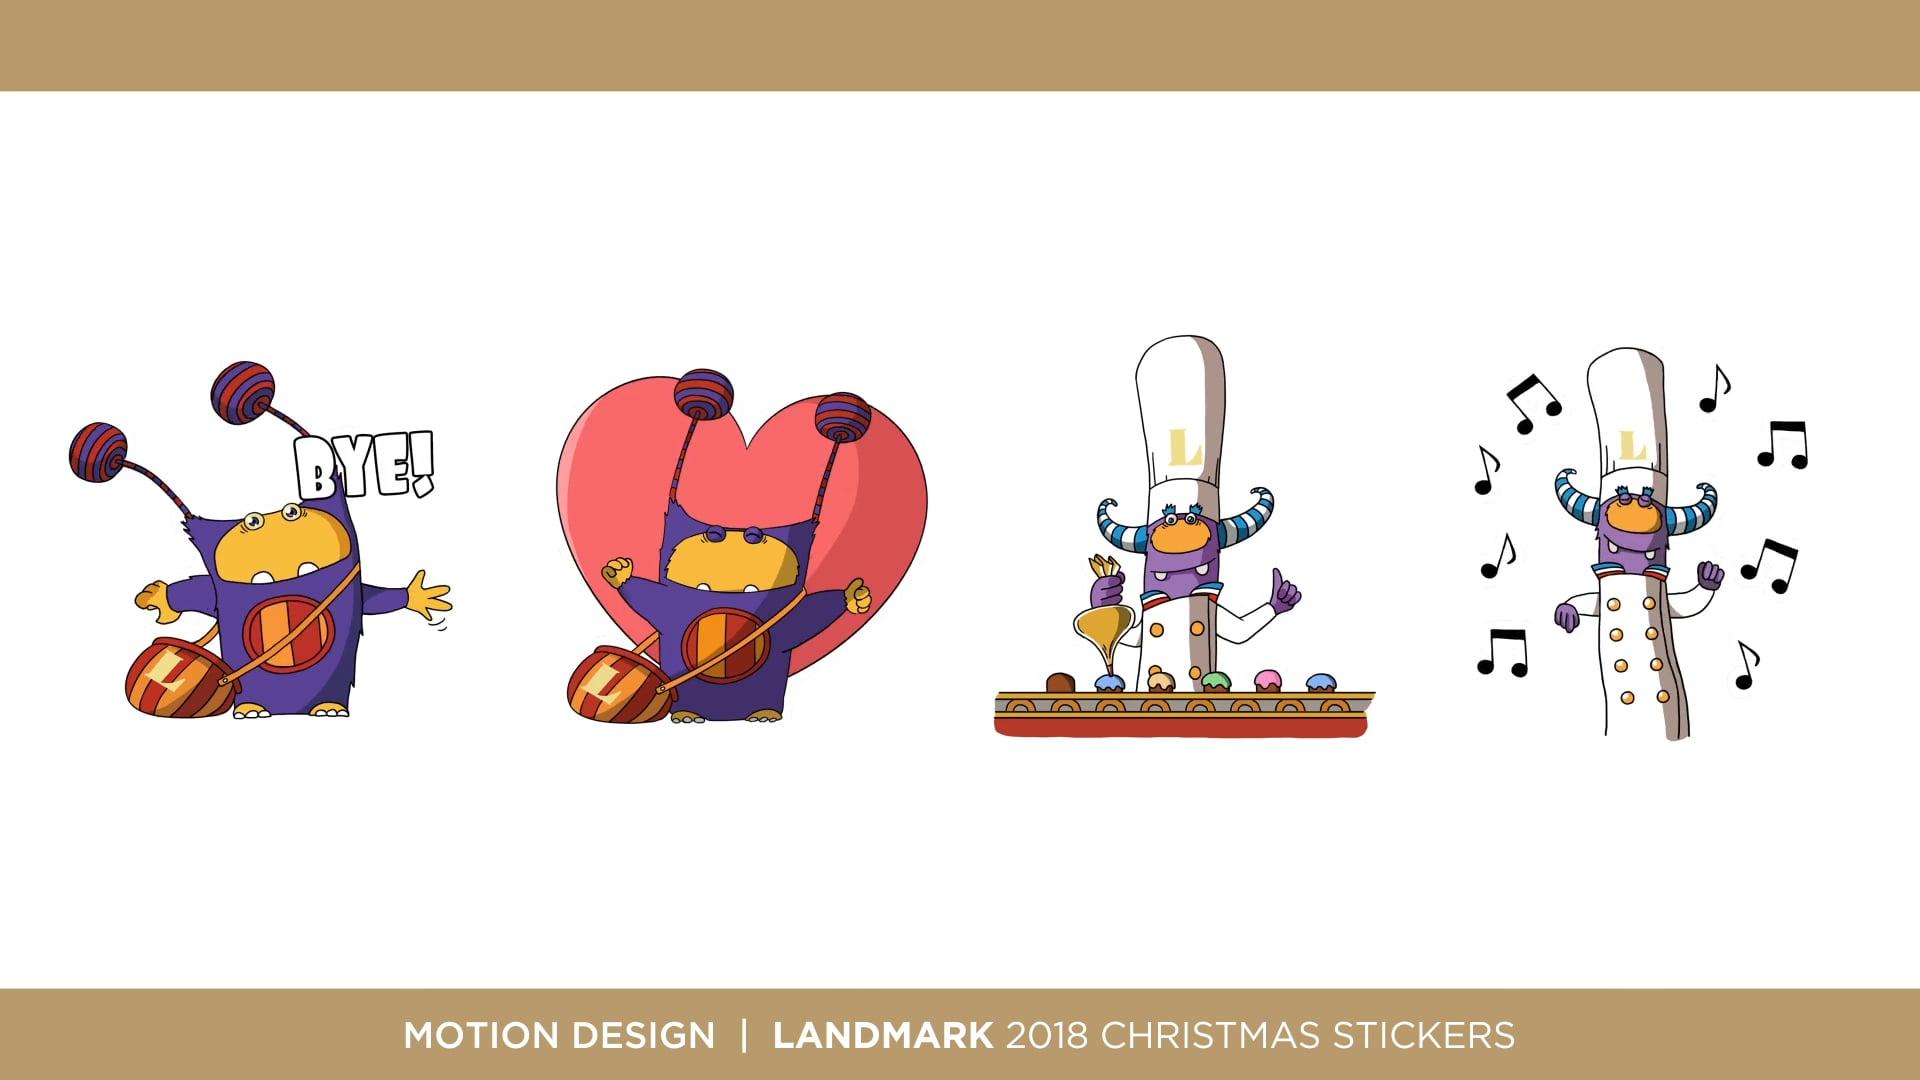 Iandmark 2018 Christmas Stickers